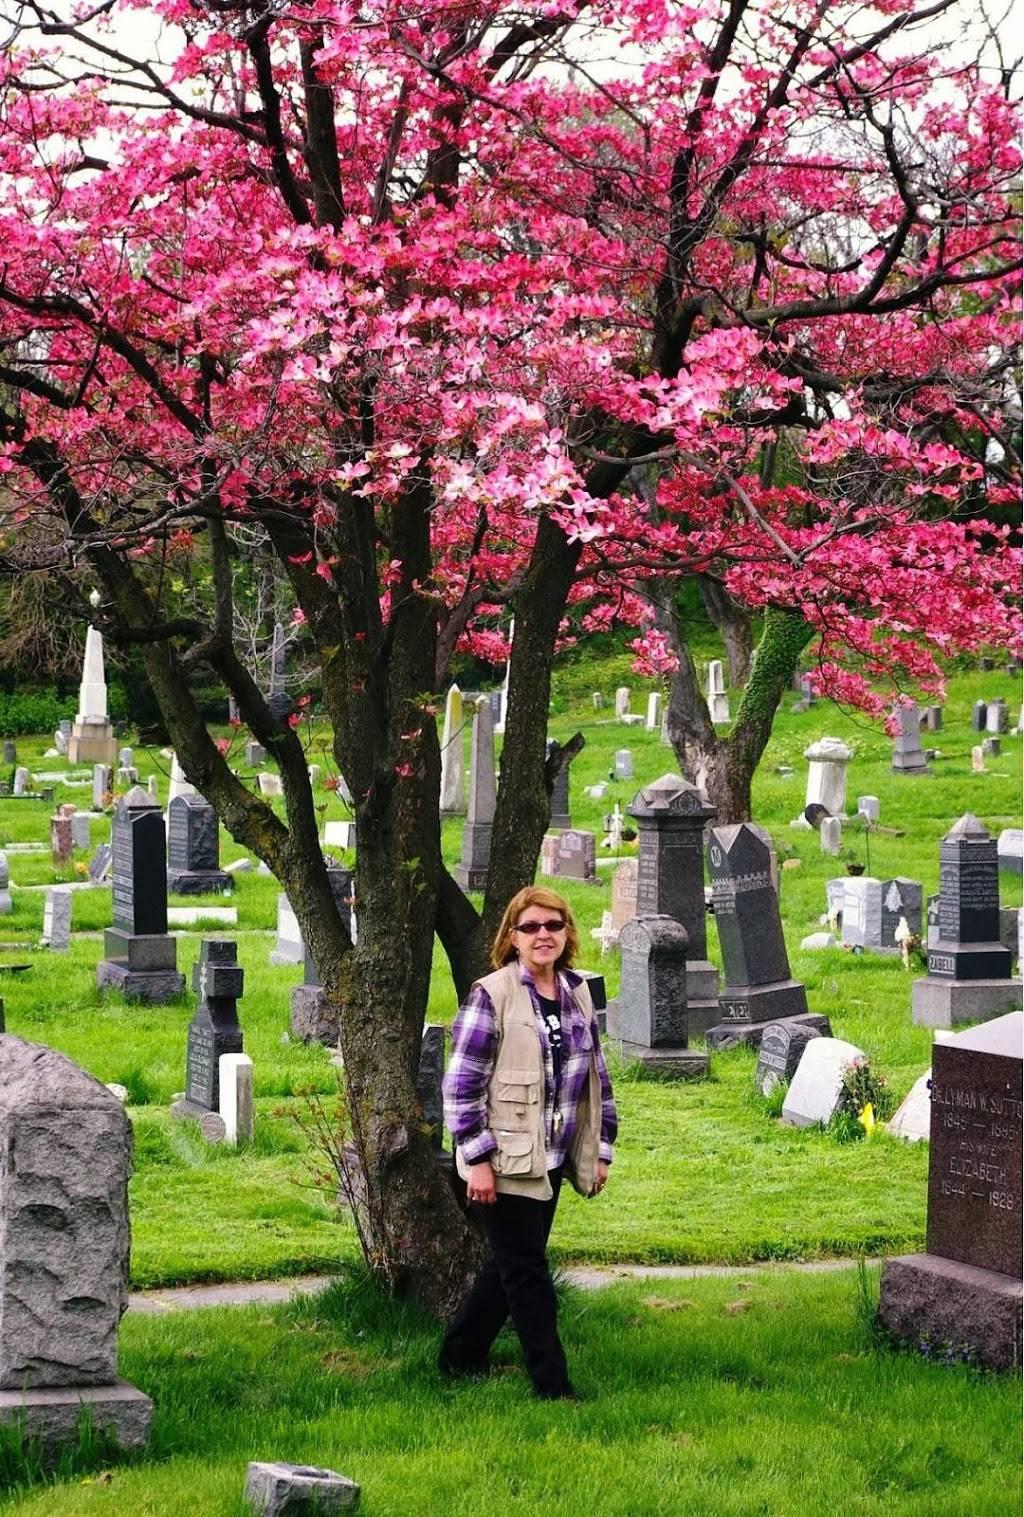 Historic Jersey City and Harsimus Cemetery - cemetery  | Photo 4 of 9 | Address: 435 Newark Ave, Jersey City, NJ 07302, USA | Phone: (201) 707-0738